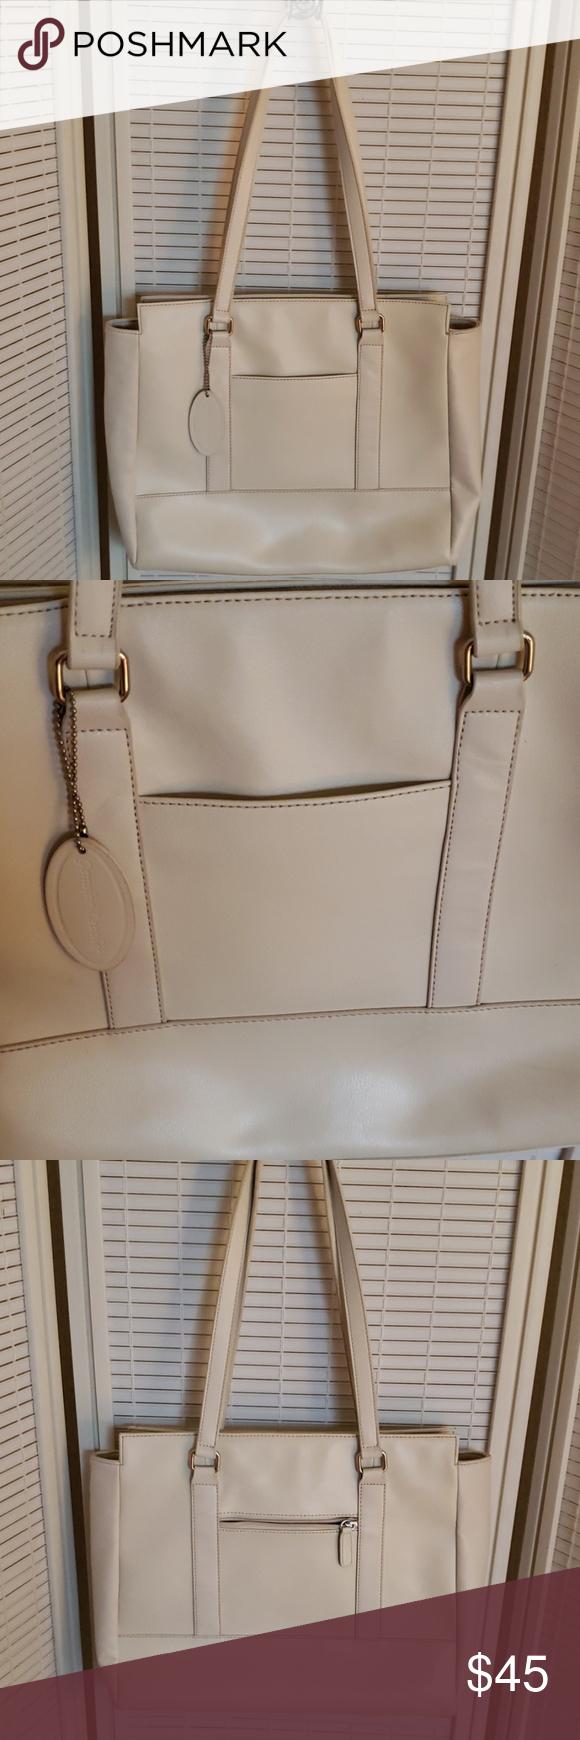 "Wilson Leather Bag 13"" x 12"" x 3"", shoulder strap xrop 12"